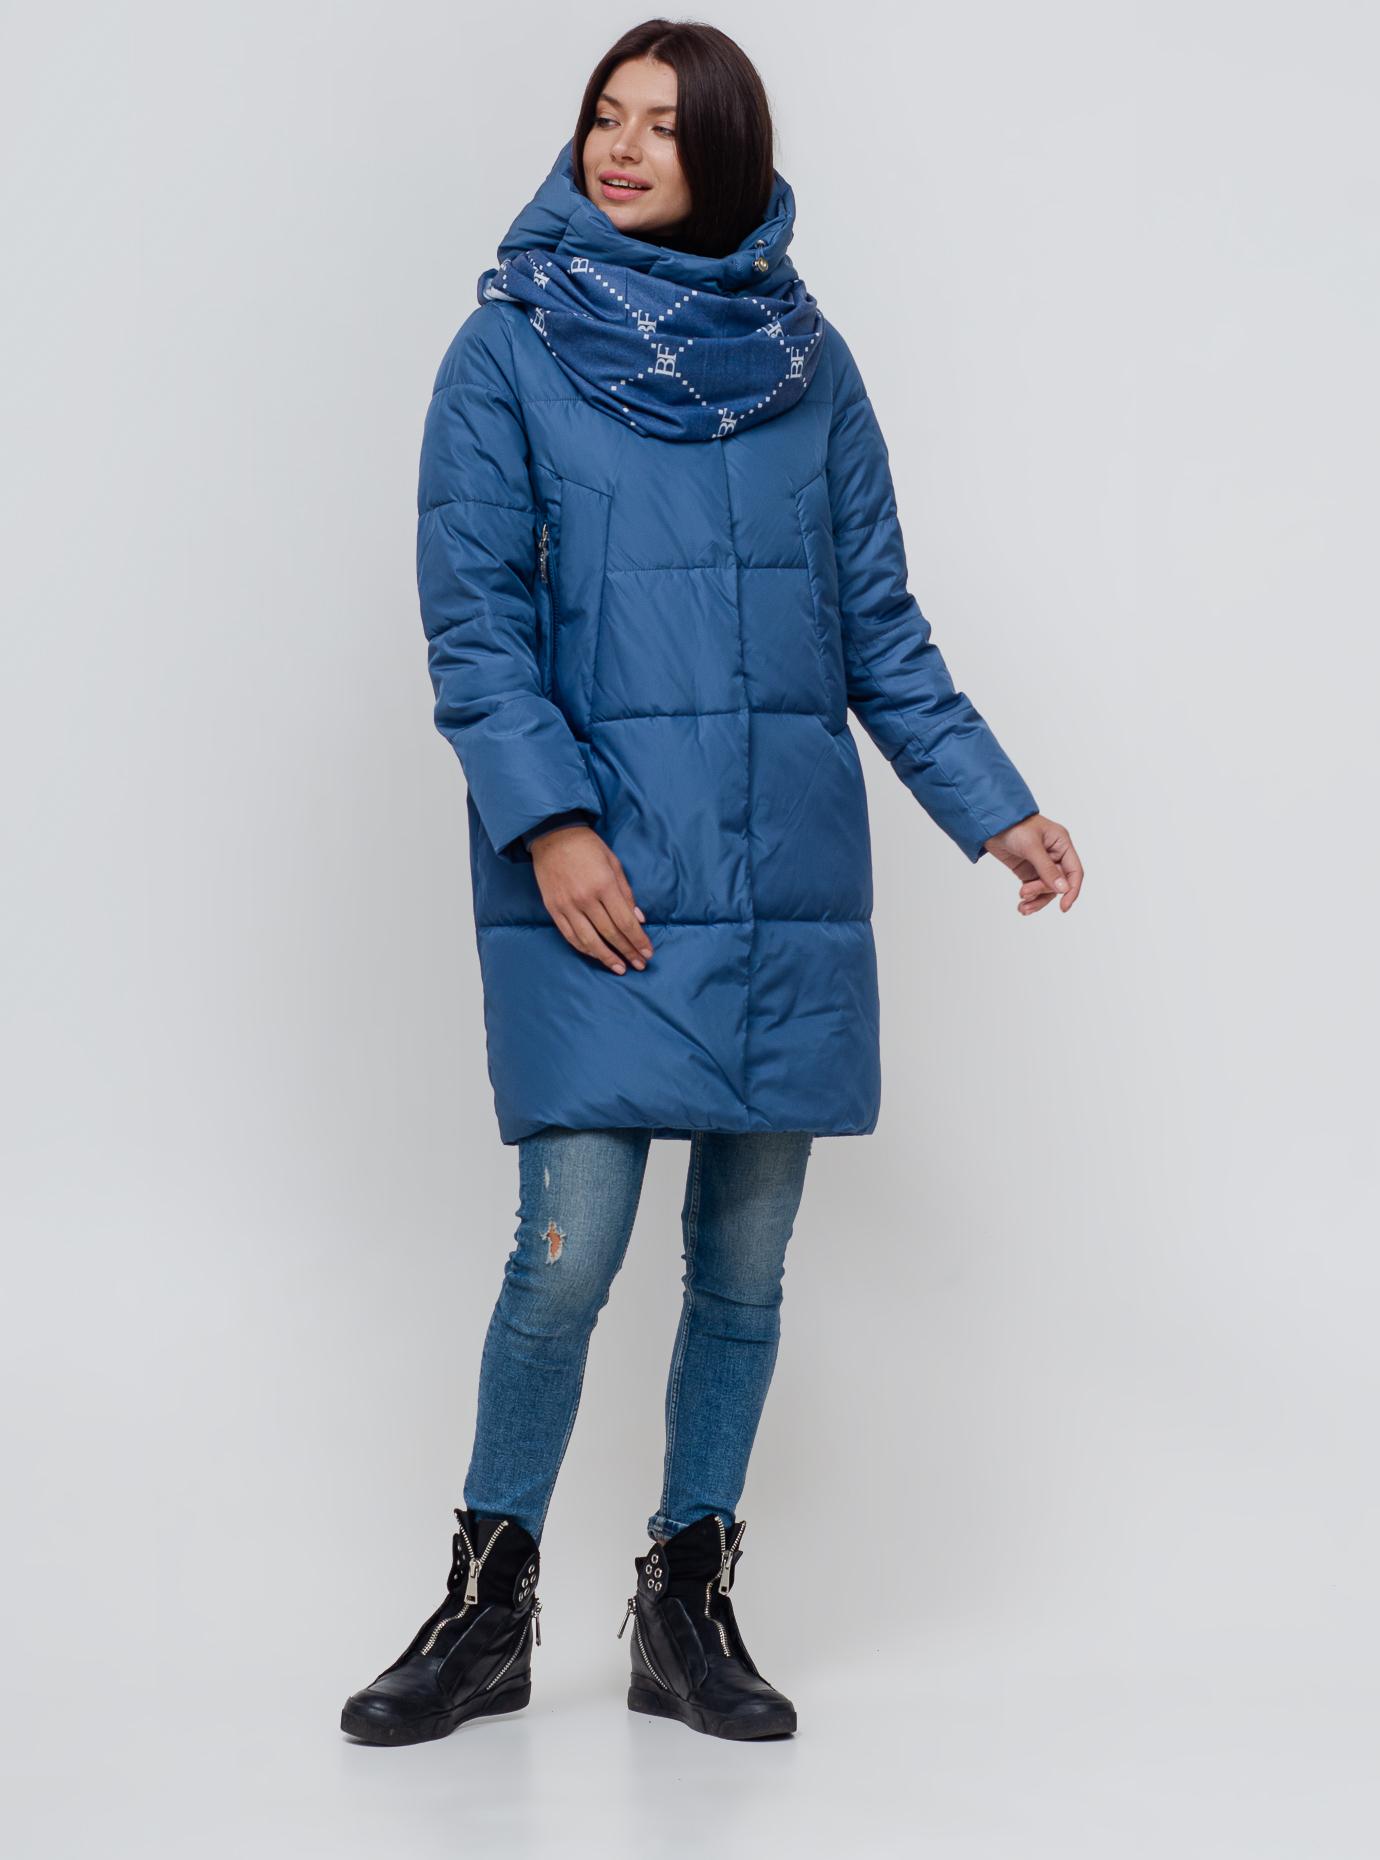 Куртка зимова довга стьобана Джинс 42 (02-N200203): фото - Alster.ua